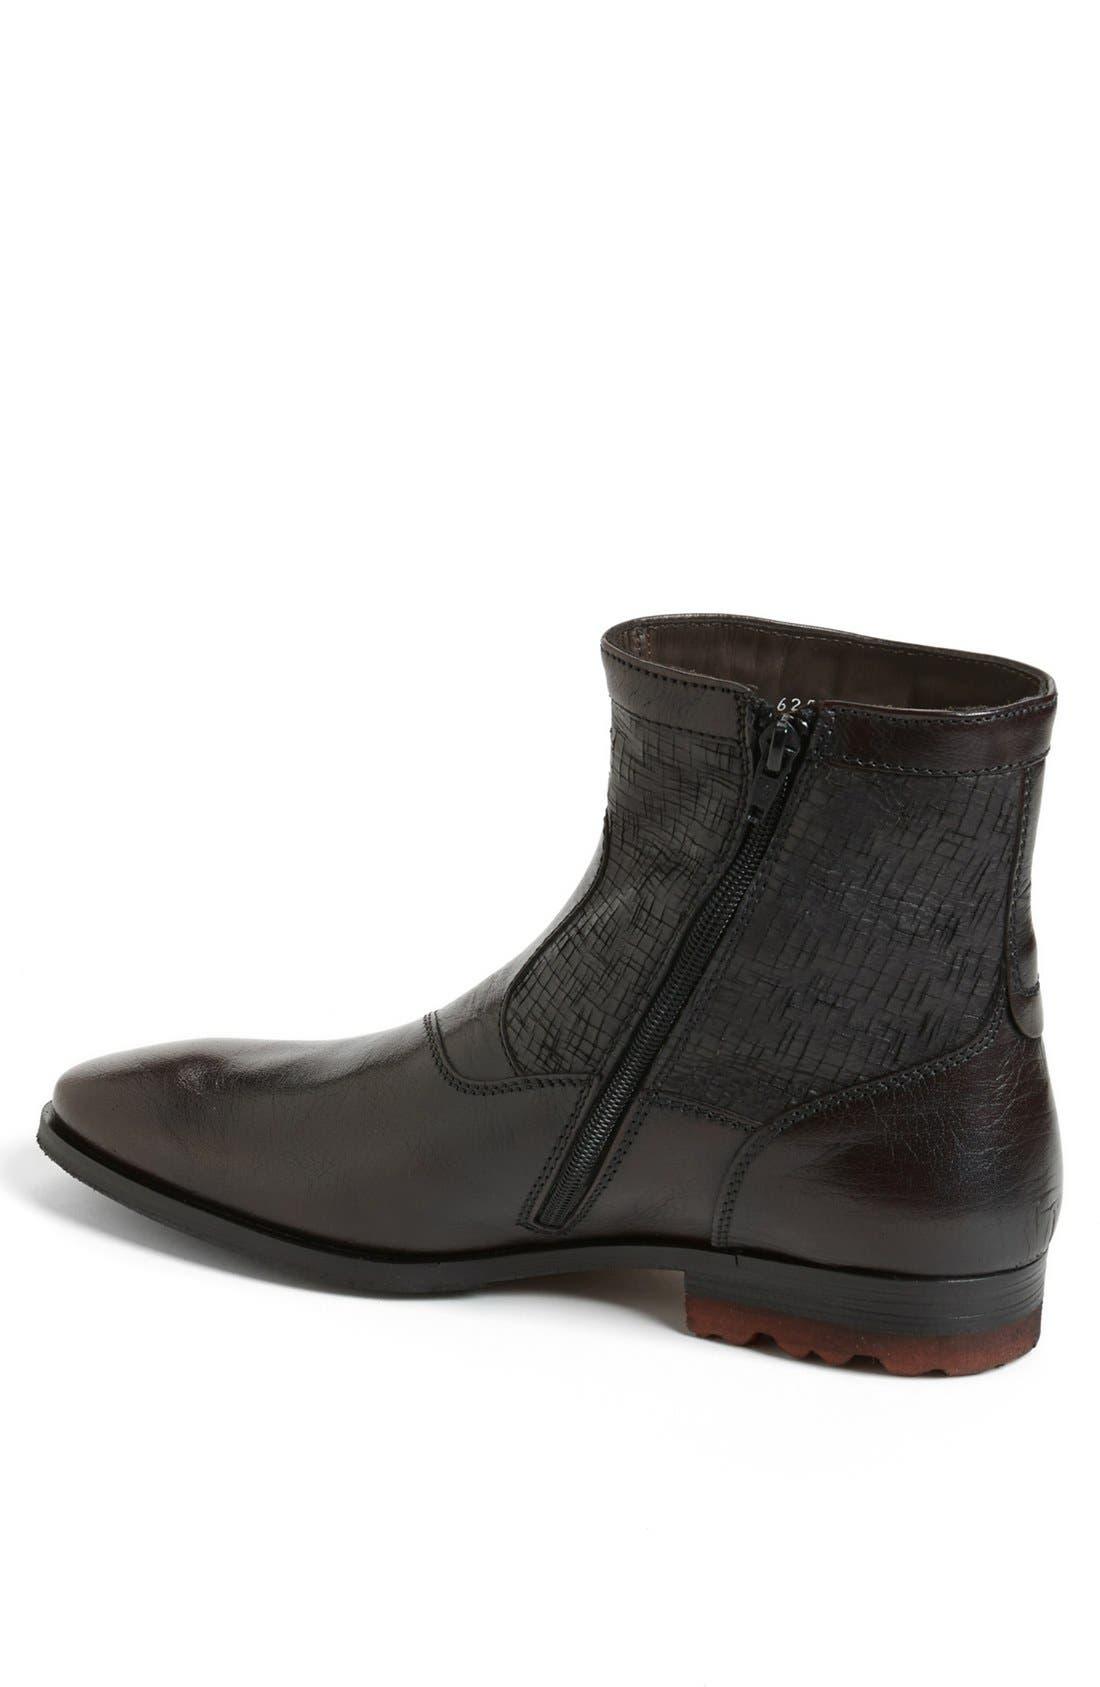 Alternate Image 2  - Bacco Bucci 'Devito' Zip boot (Men) (Online Only)